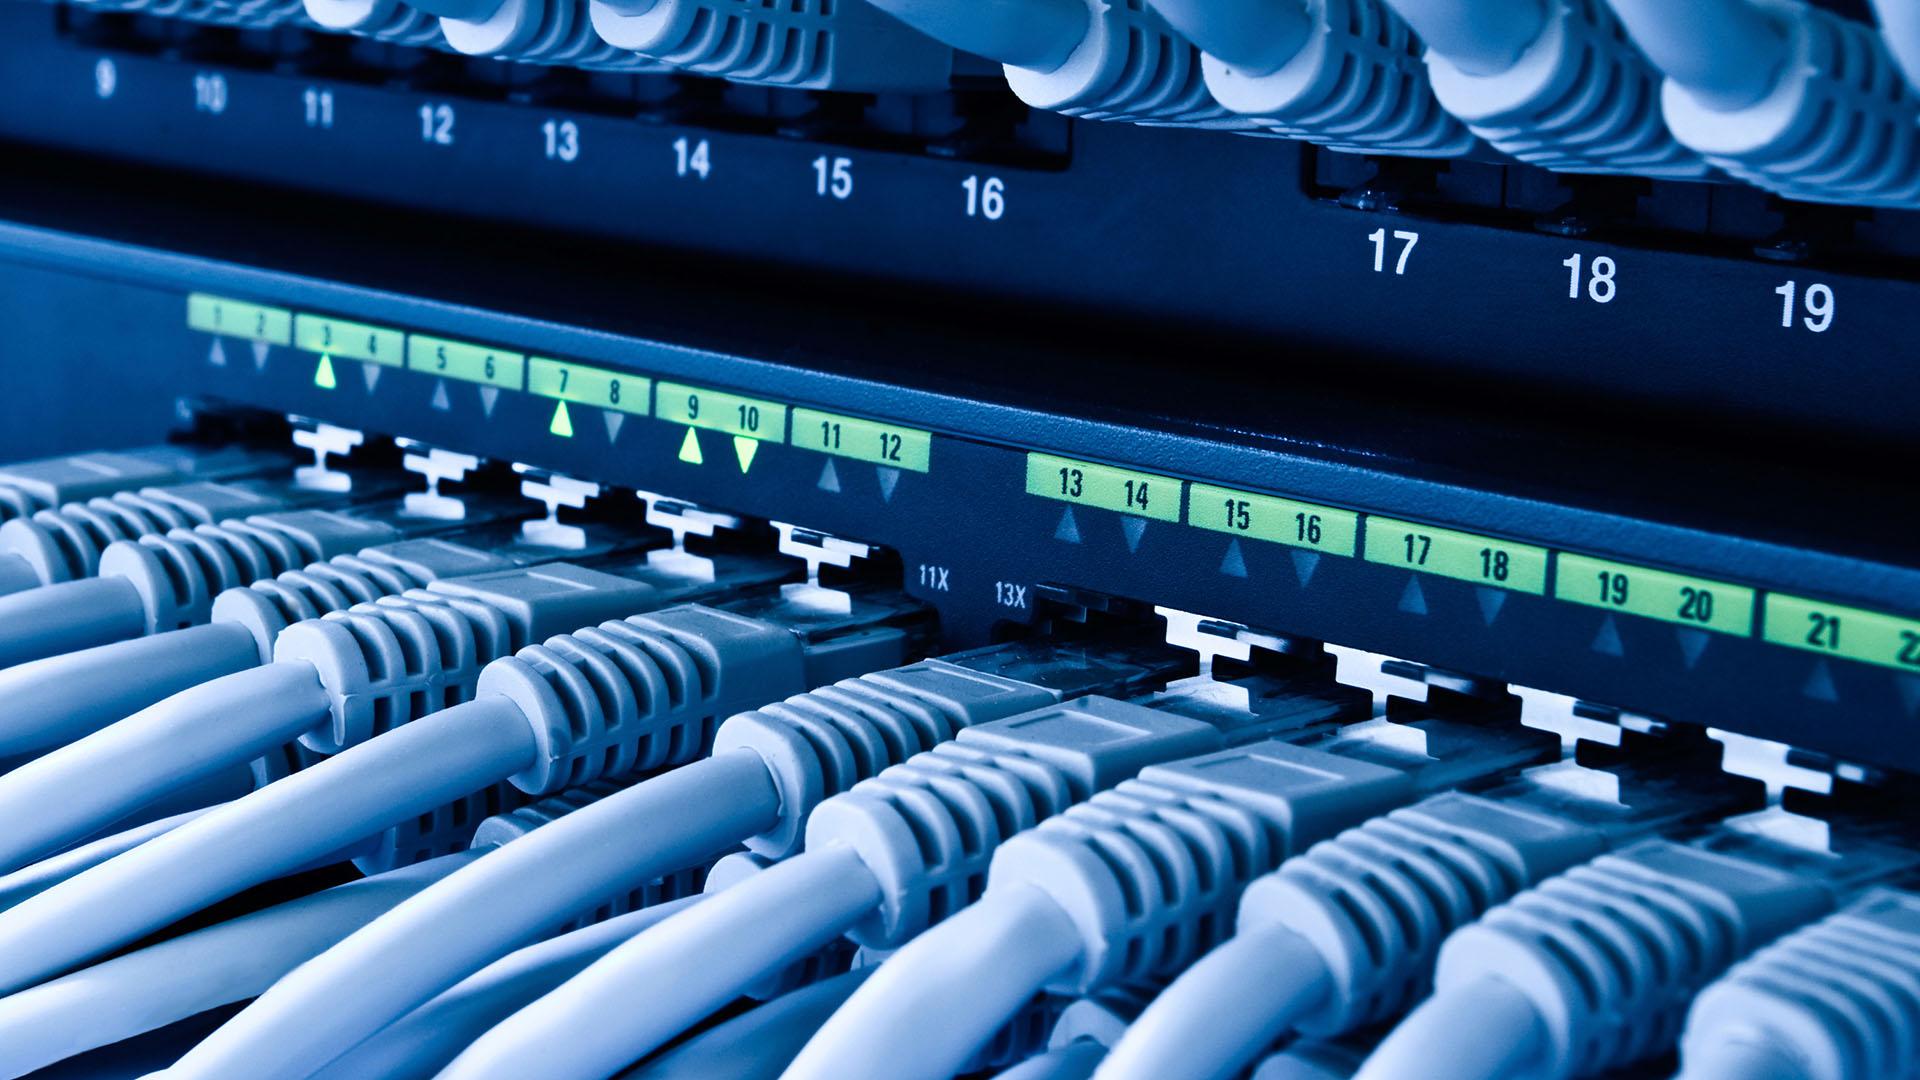 Fort Pierce Florida Premier Voice & Data Network Cabling Provider